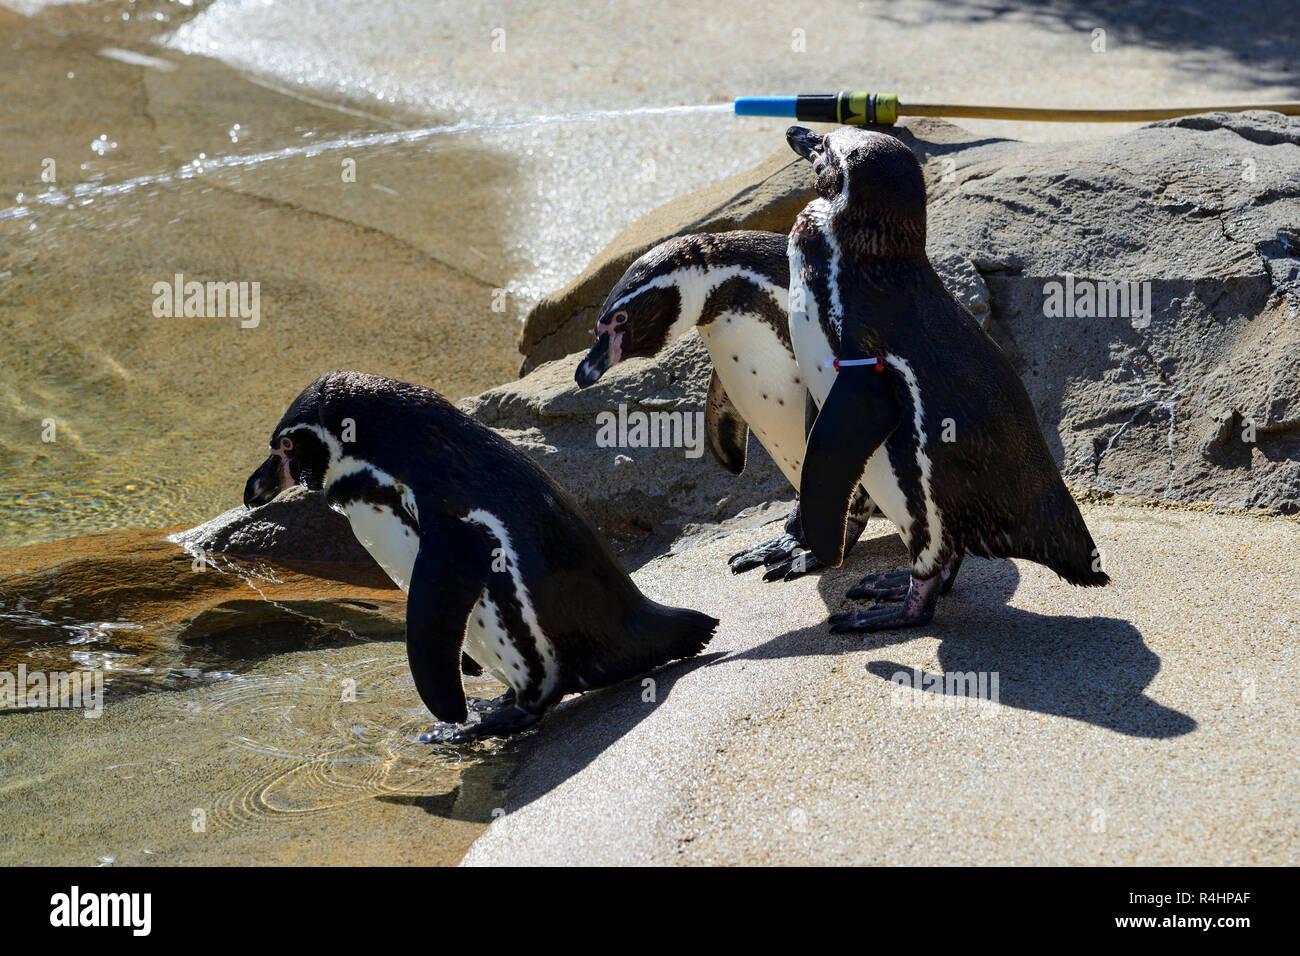 Humboldt Penguins (Sphensicus humboldti), Blair Drummond Safari Park, near Stirling, Scotland, UK - Stock Image